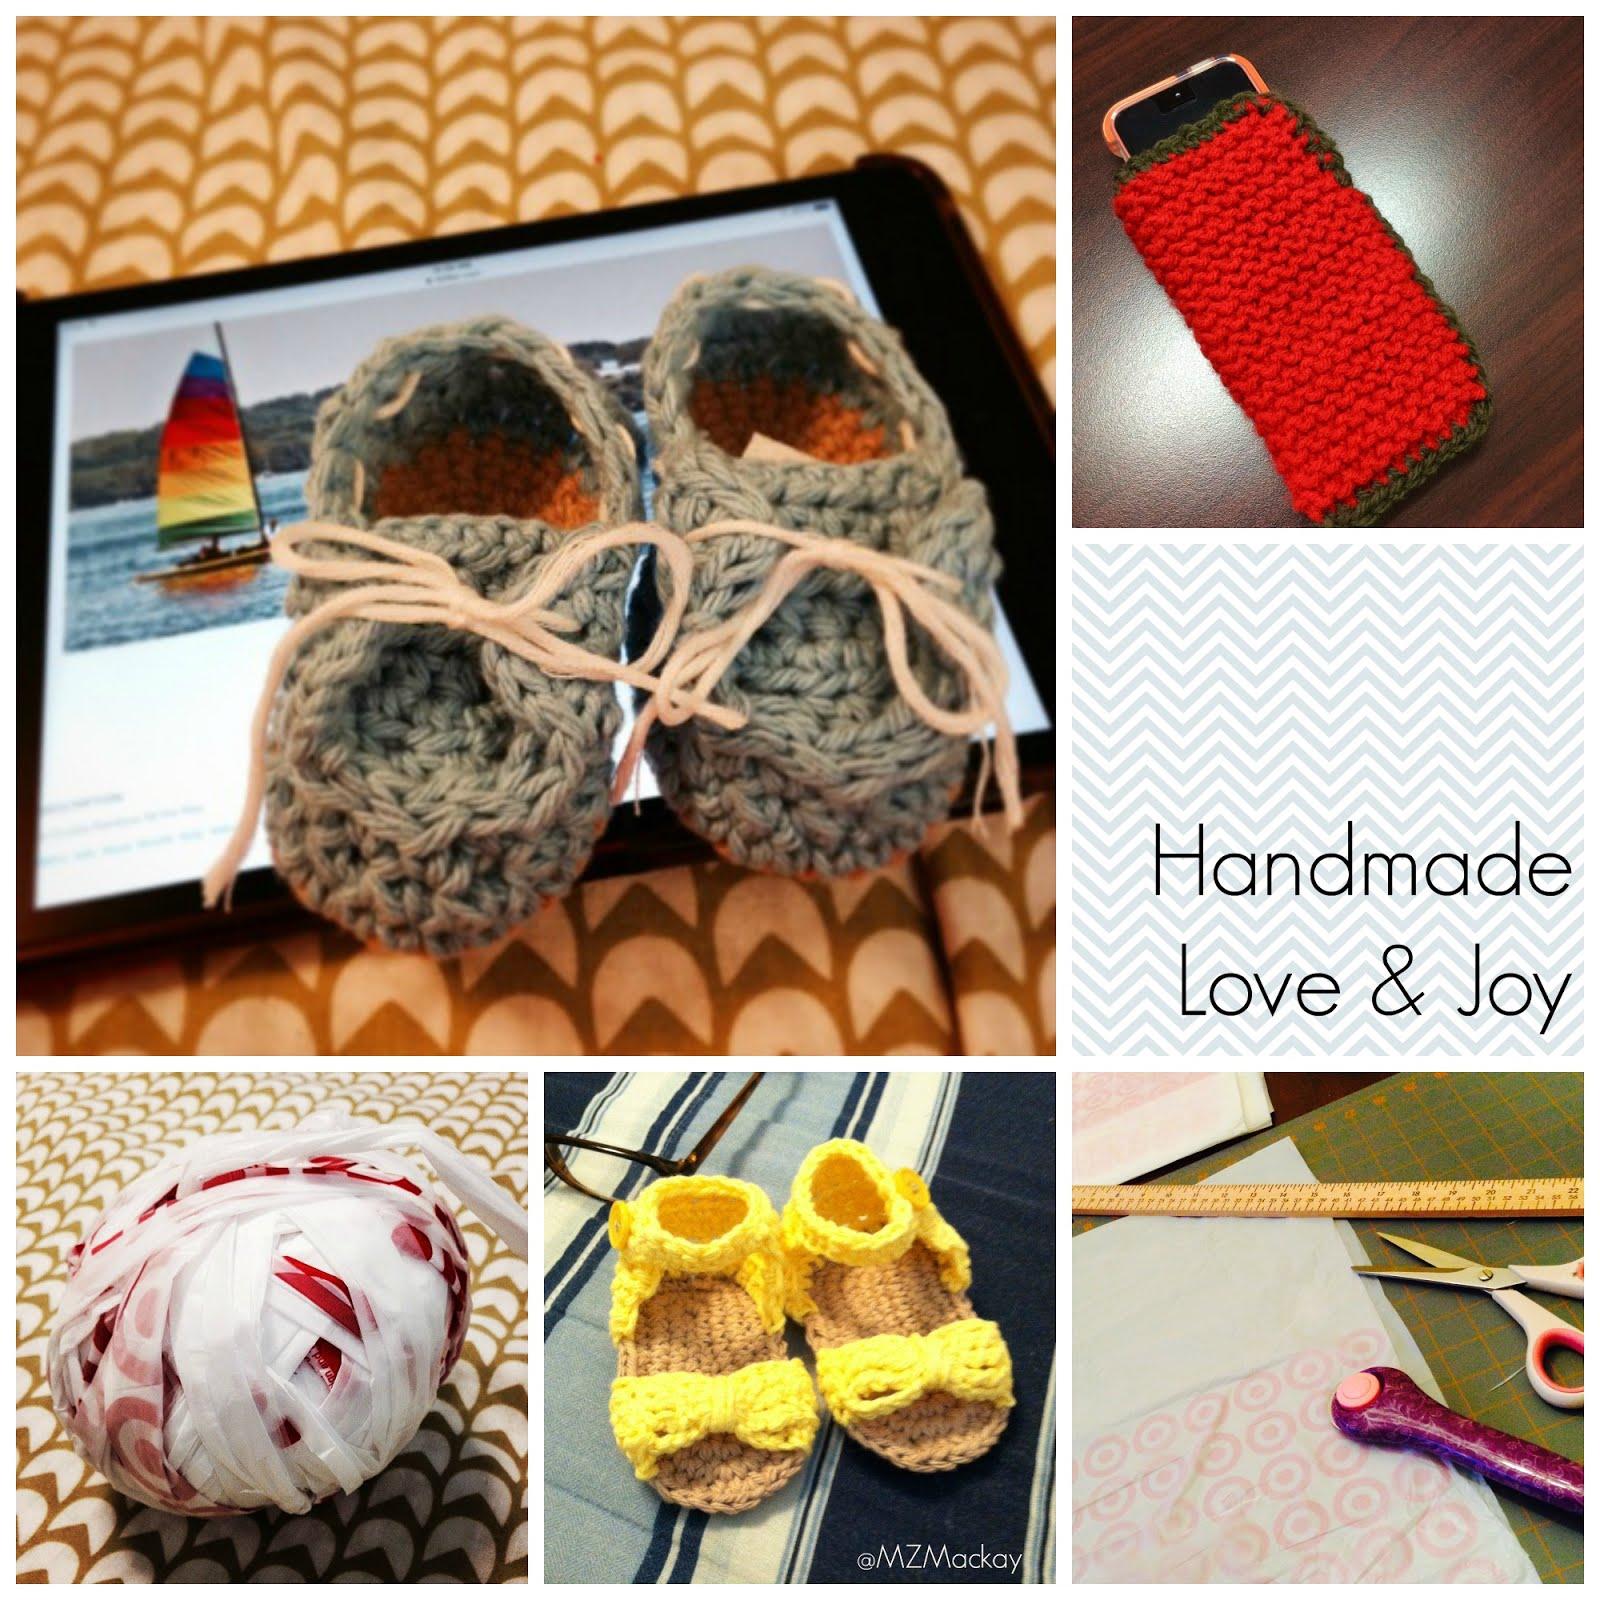 Handmade Love & Joy